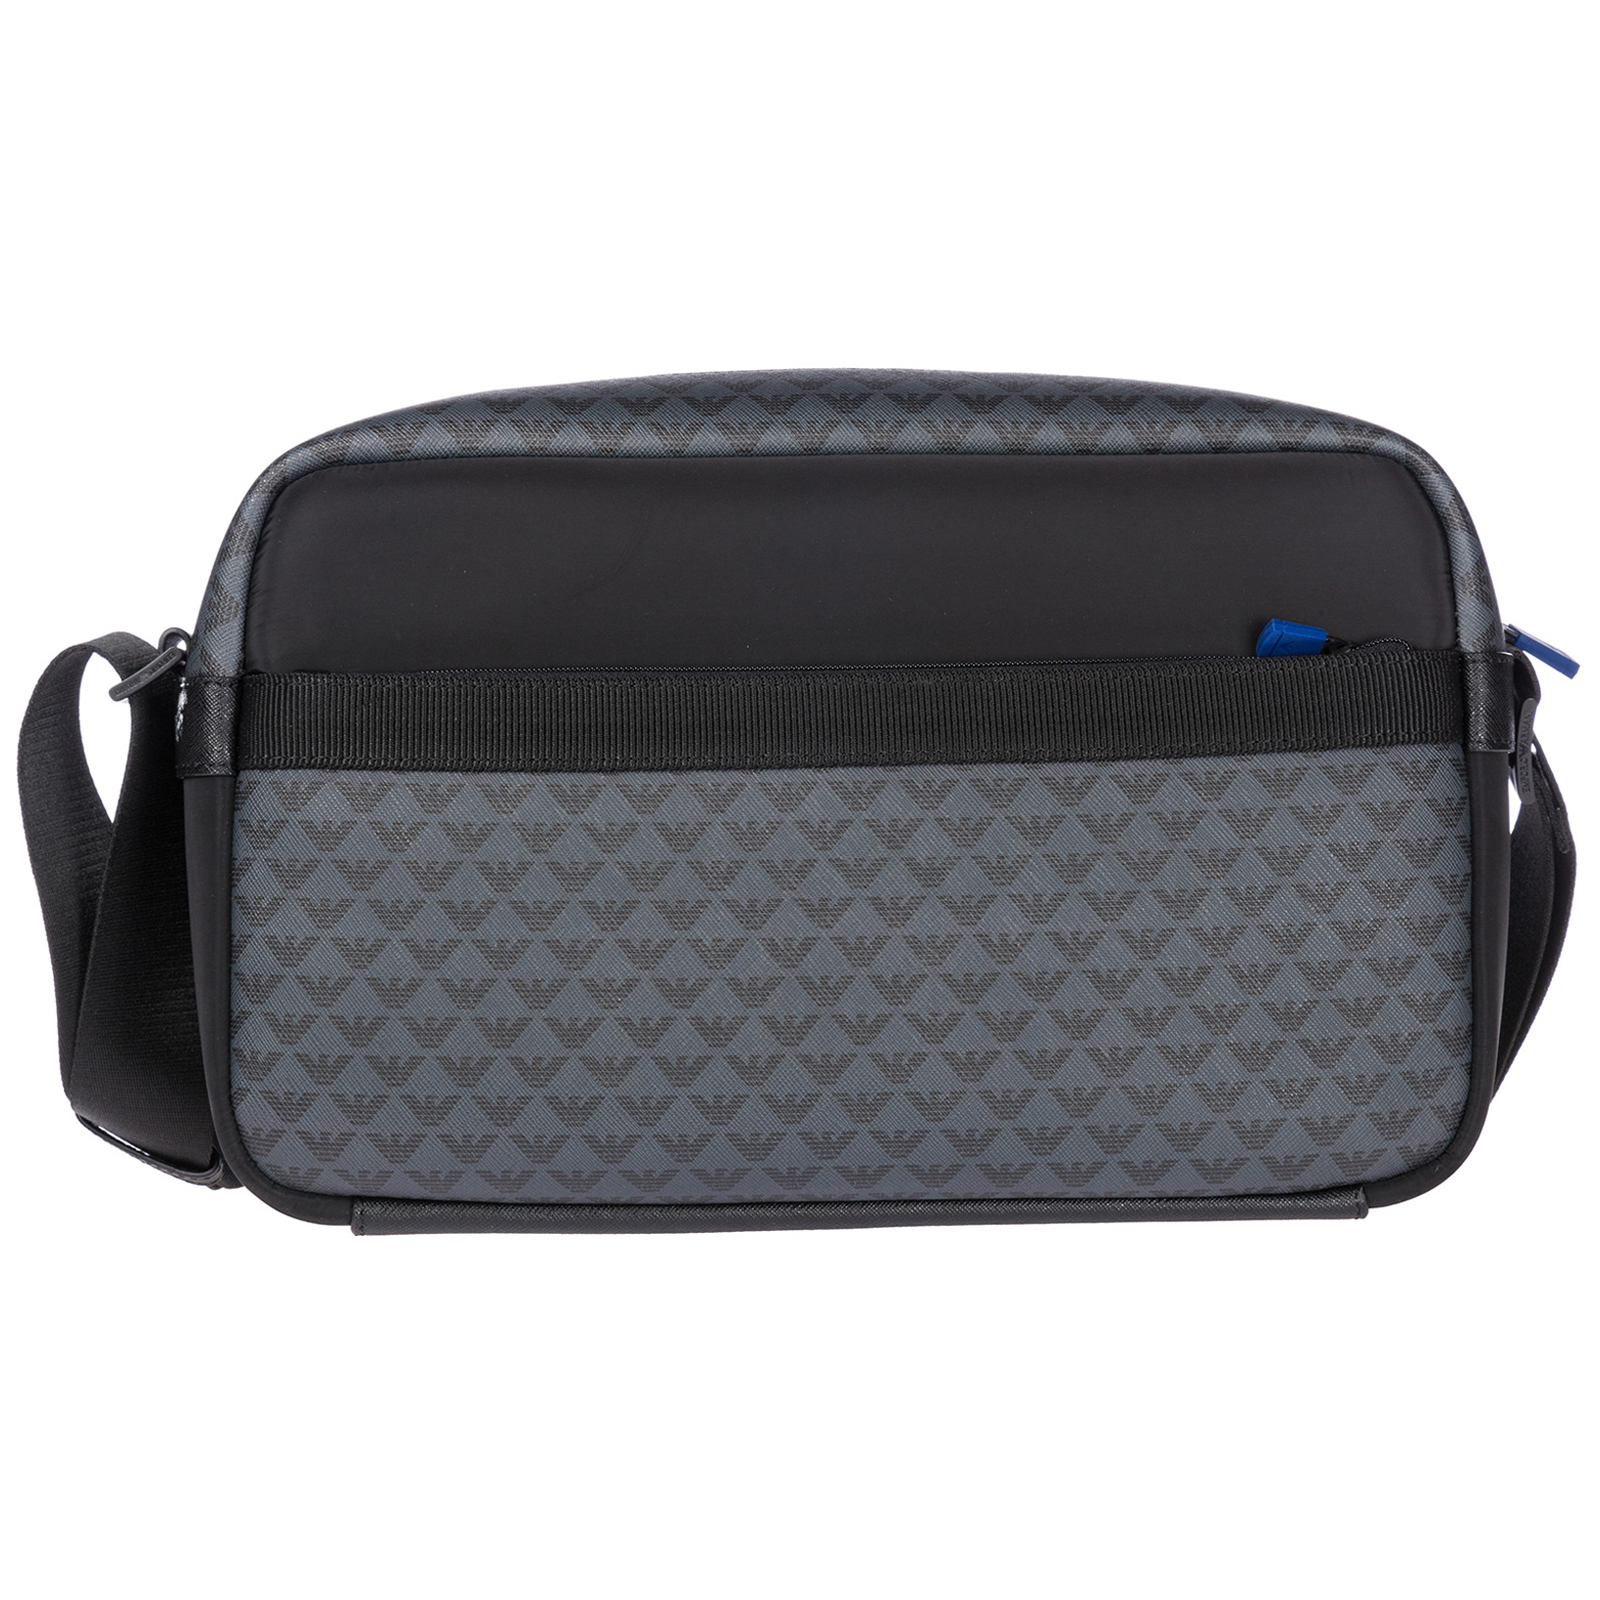 2a803b4e56a1 Emporio Armani Men S Cross-Body Messenger Shoulder Bag In Black ...